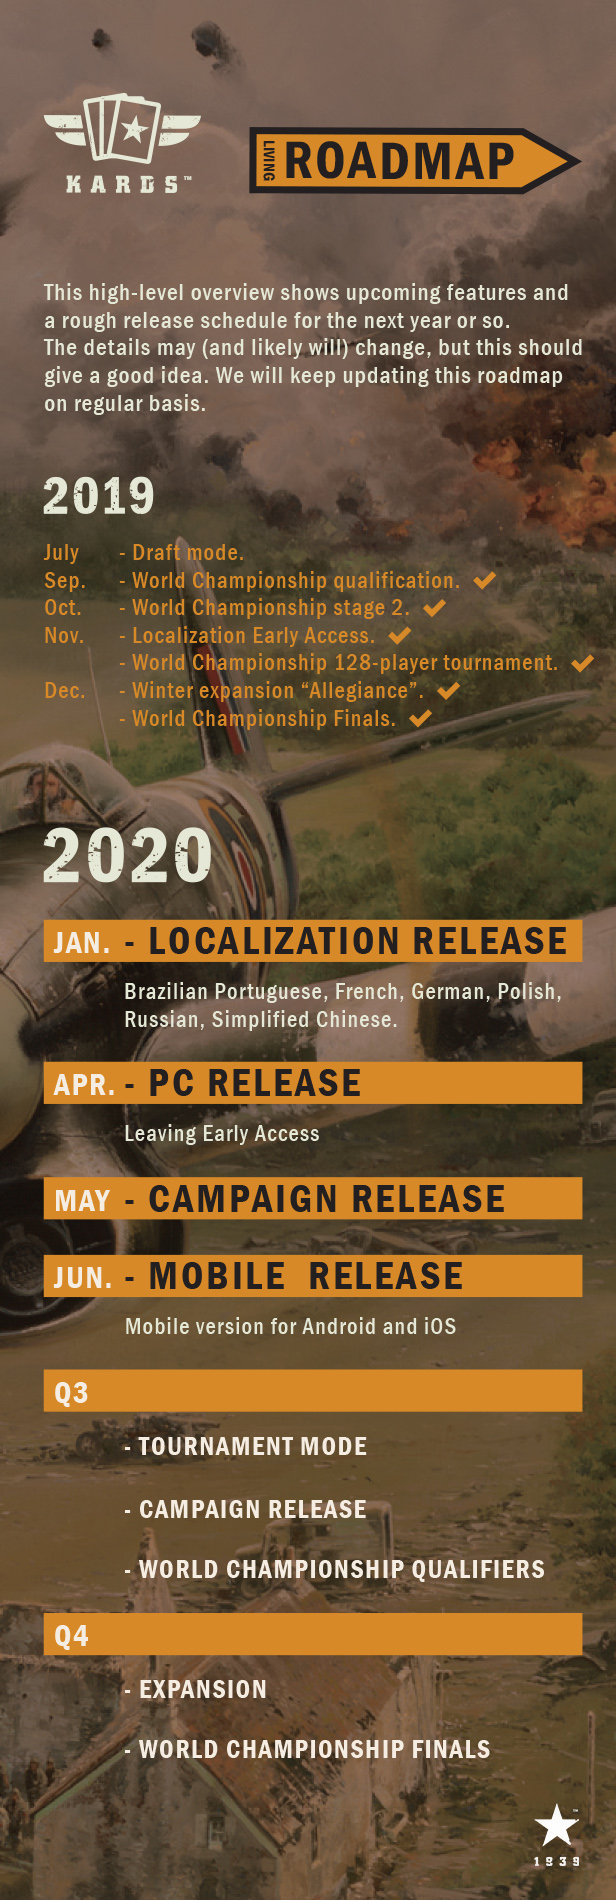 2020-Q1-Roadmap-Update-Feb14.jpg?t=1586266433